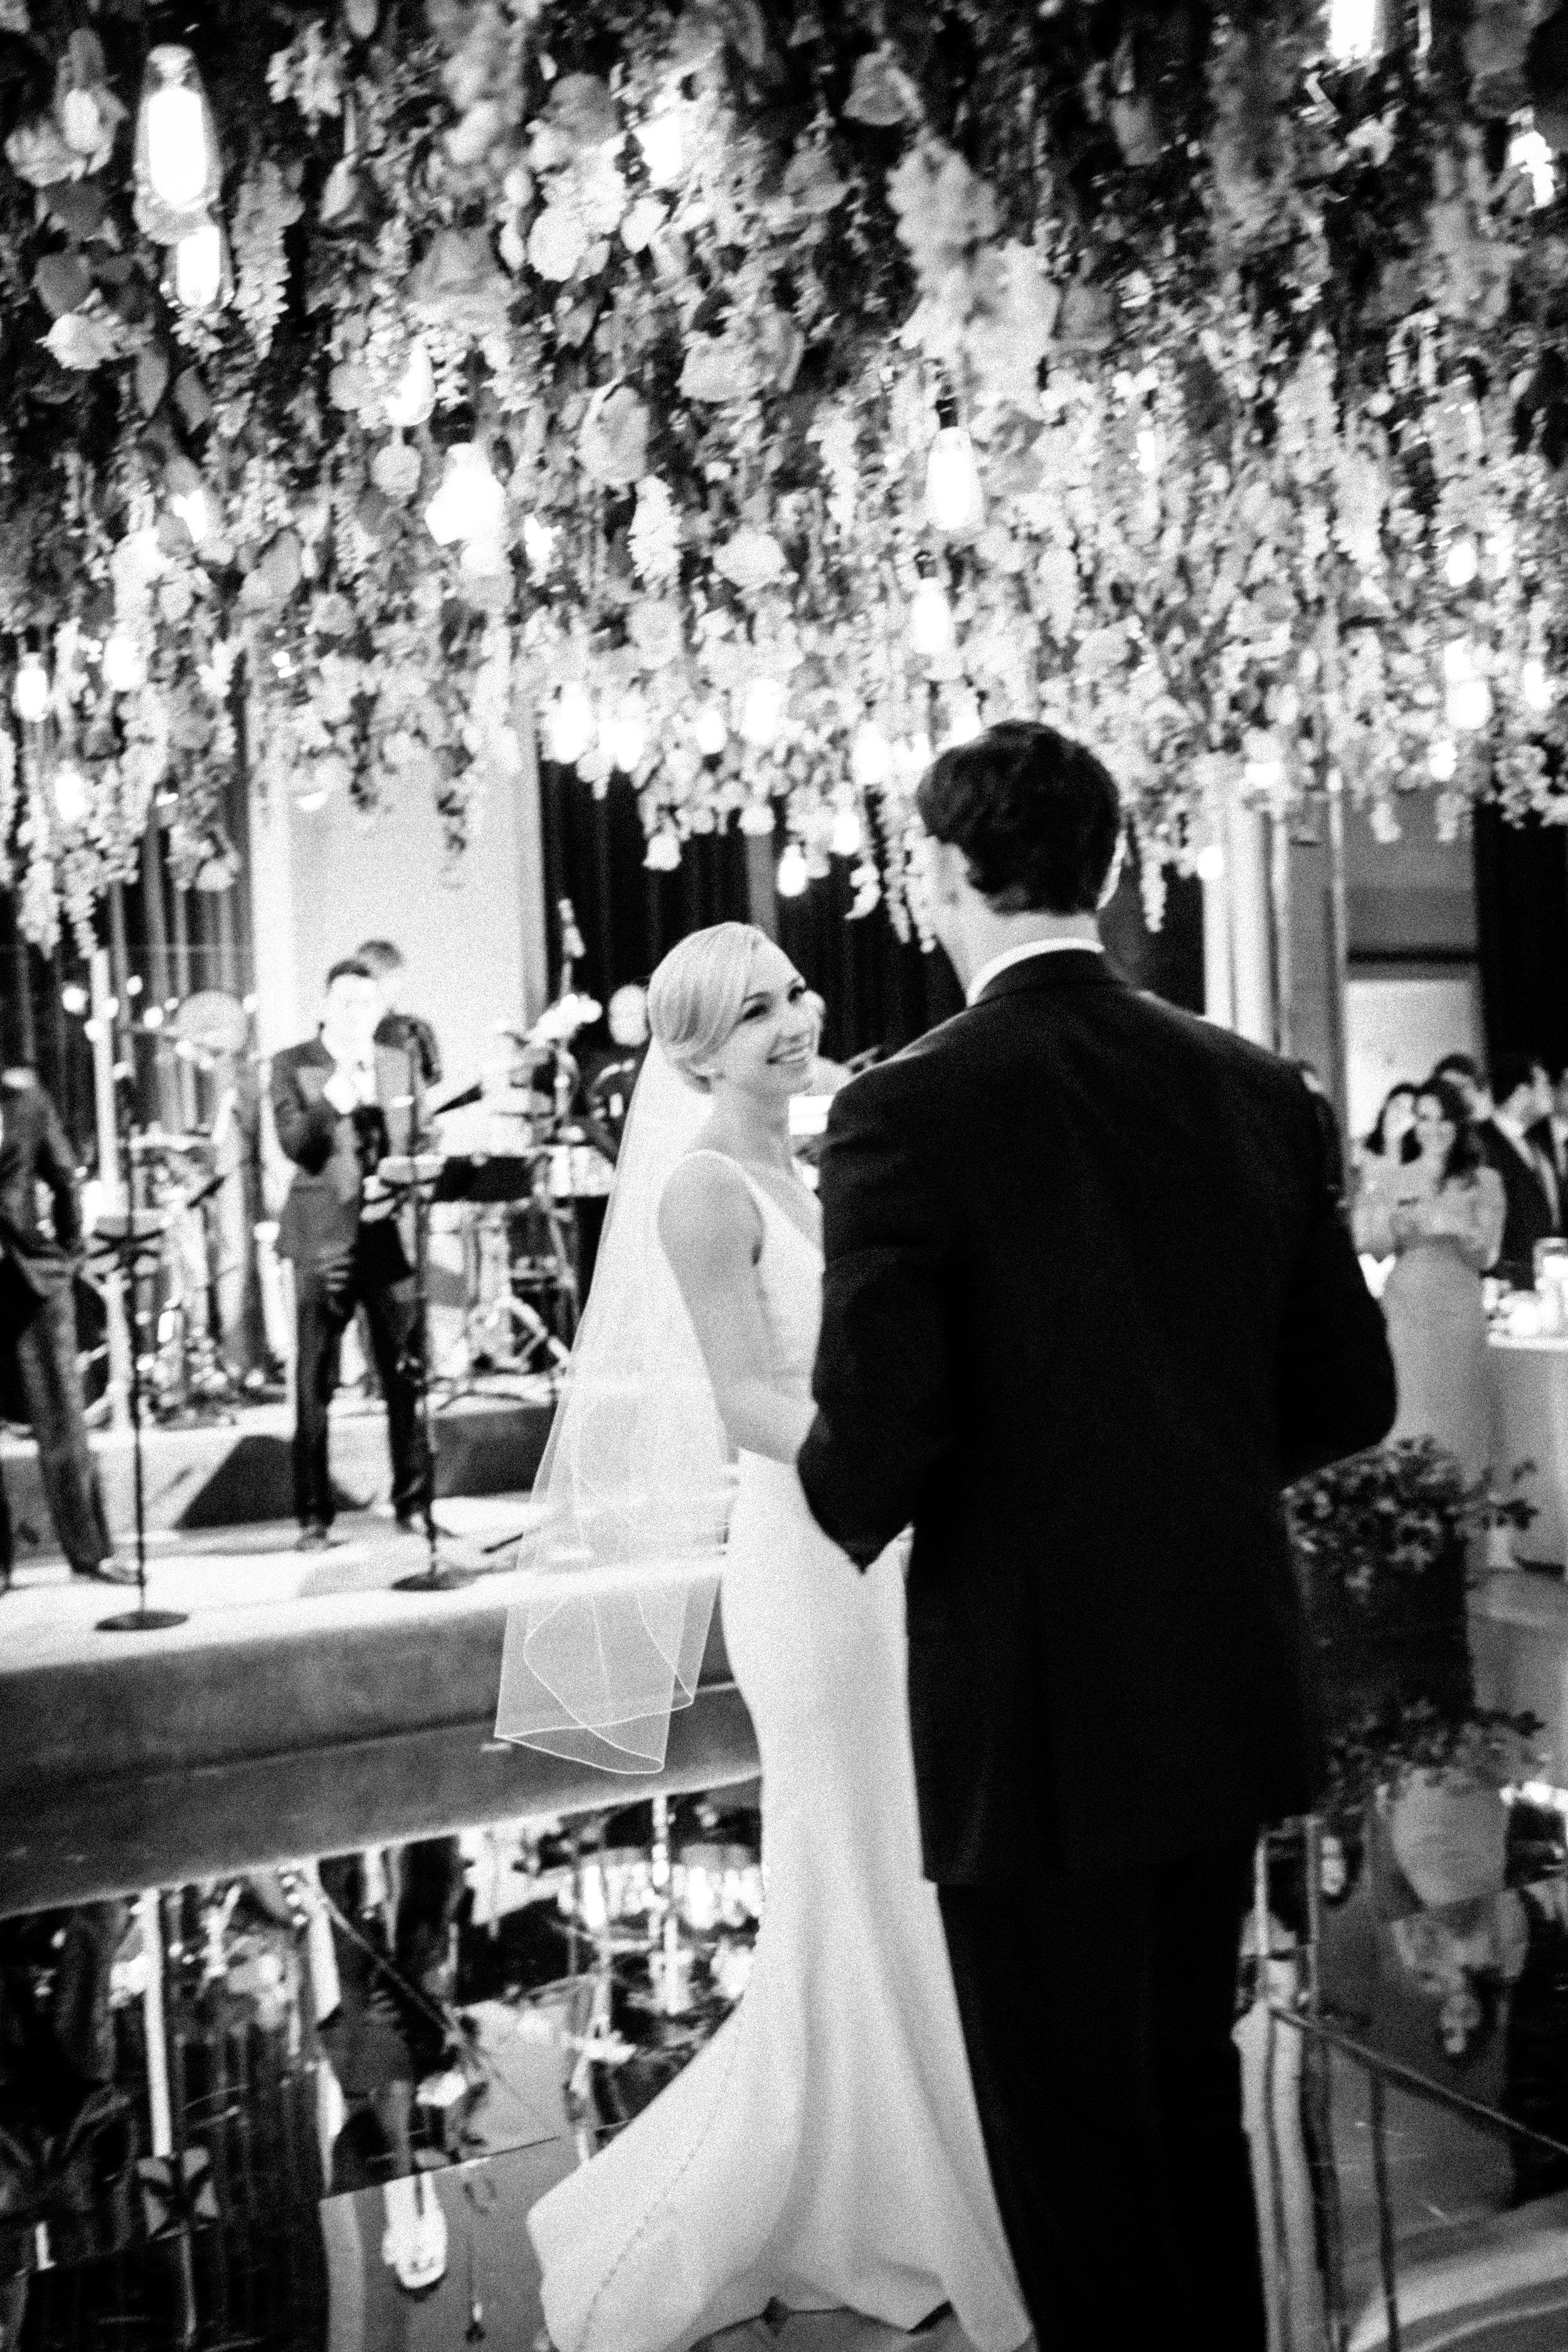 10-24-15 Leahy Wedding Bently00051.jpg